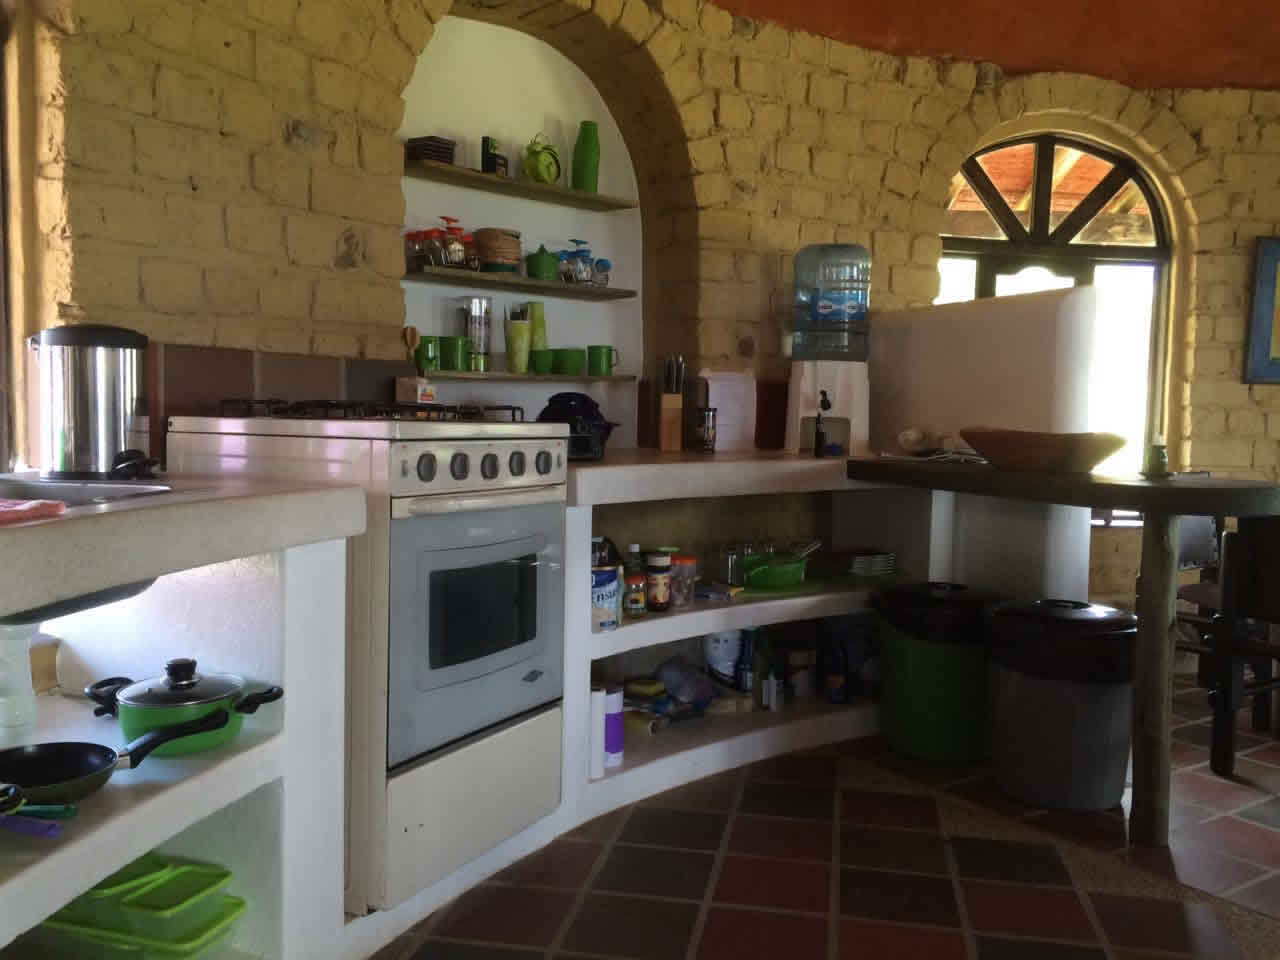 Alquiler casa Jishana Villa de Leyva - Cocina